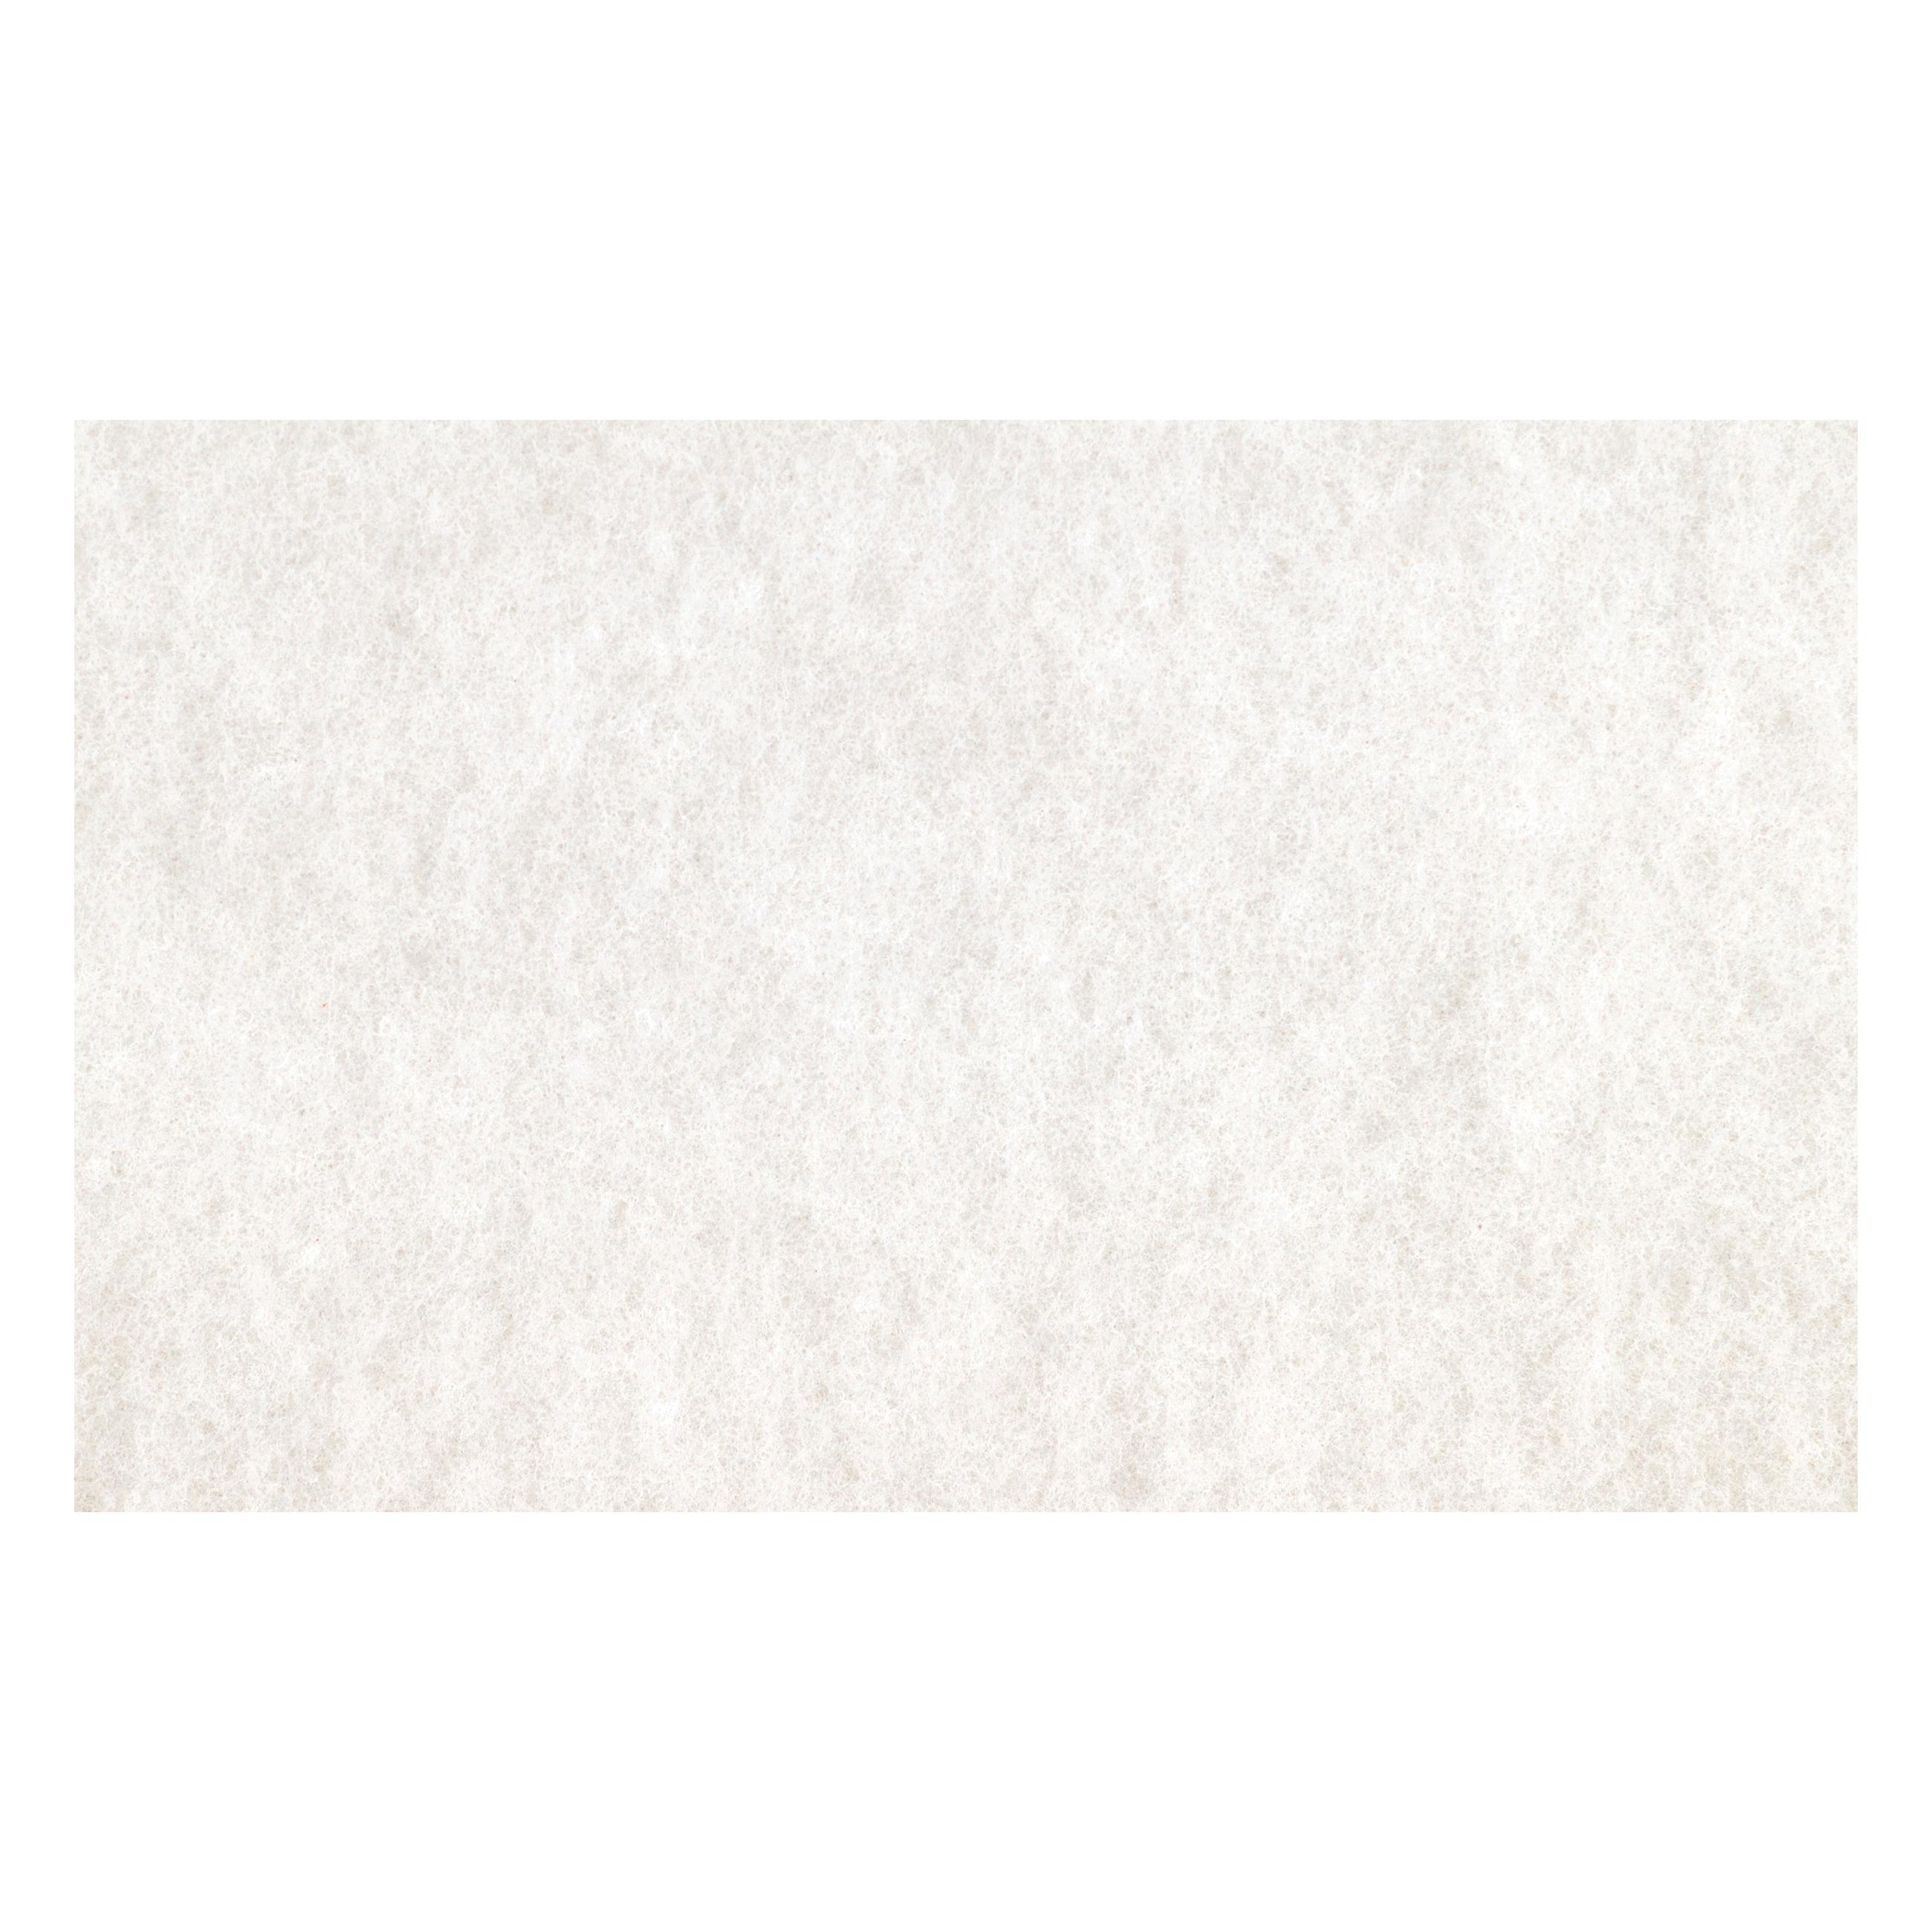 Scotch-Brite™ 048011-09035 CP-SH Waterproof Non-Woven Sanding Sheet, 9 in L x 3-2/3 in W, Medium Grade, Aluminum Oxide Abrasive